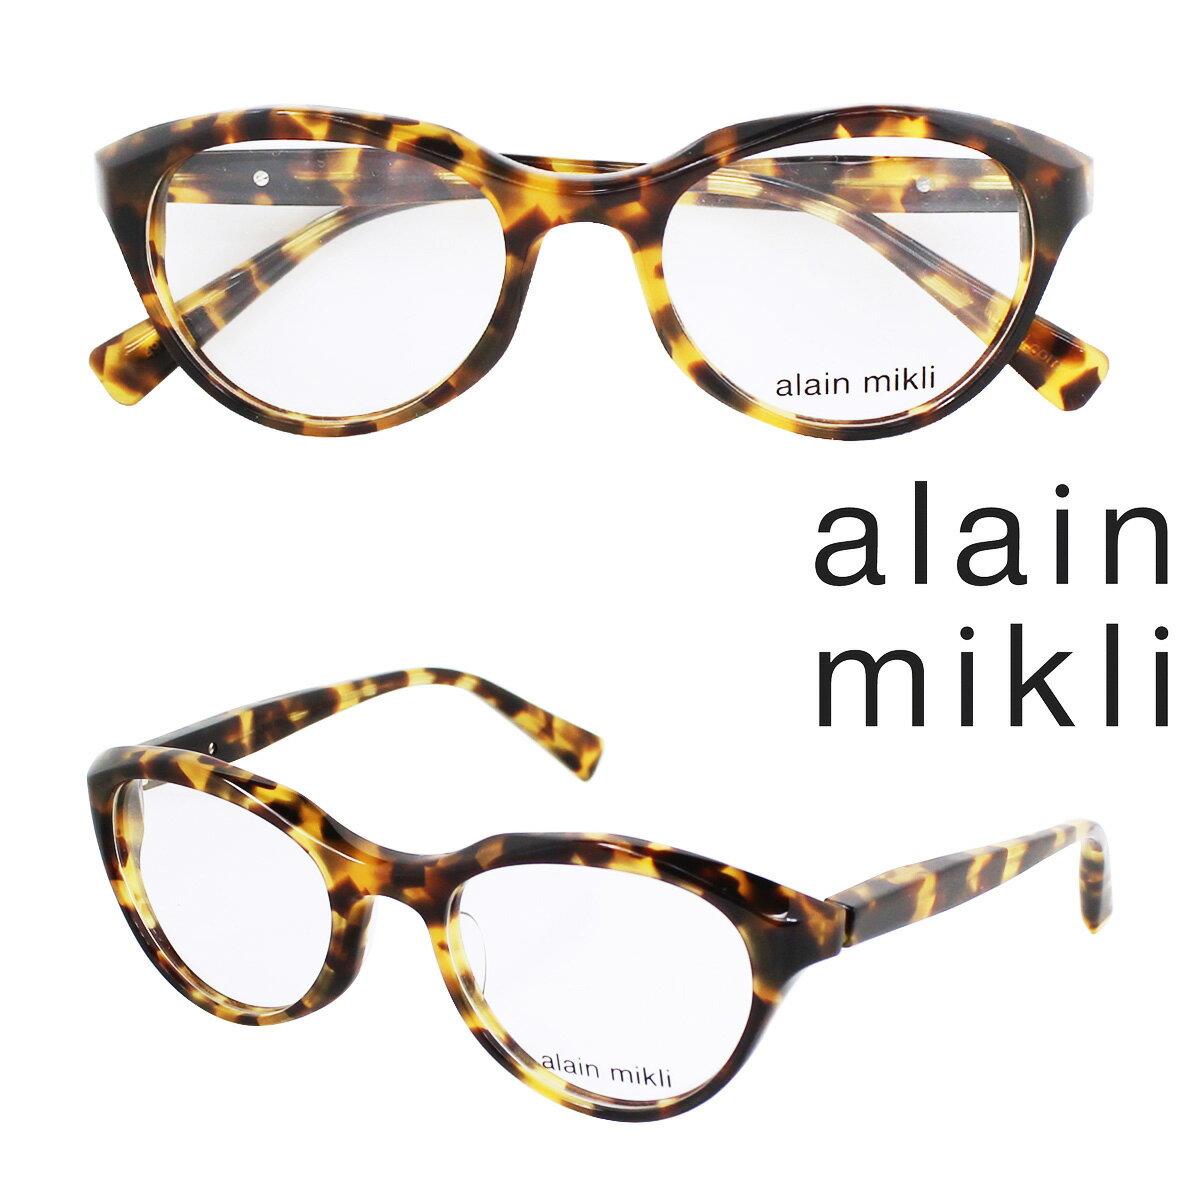 alain mikli アランミクリ メガネ 眼鏡 日本製 メンズ レディース 【返品不可】